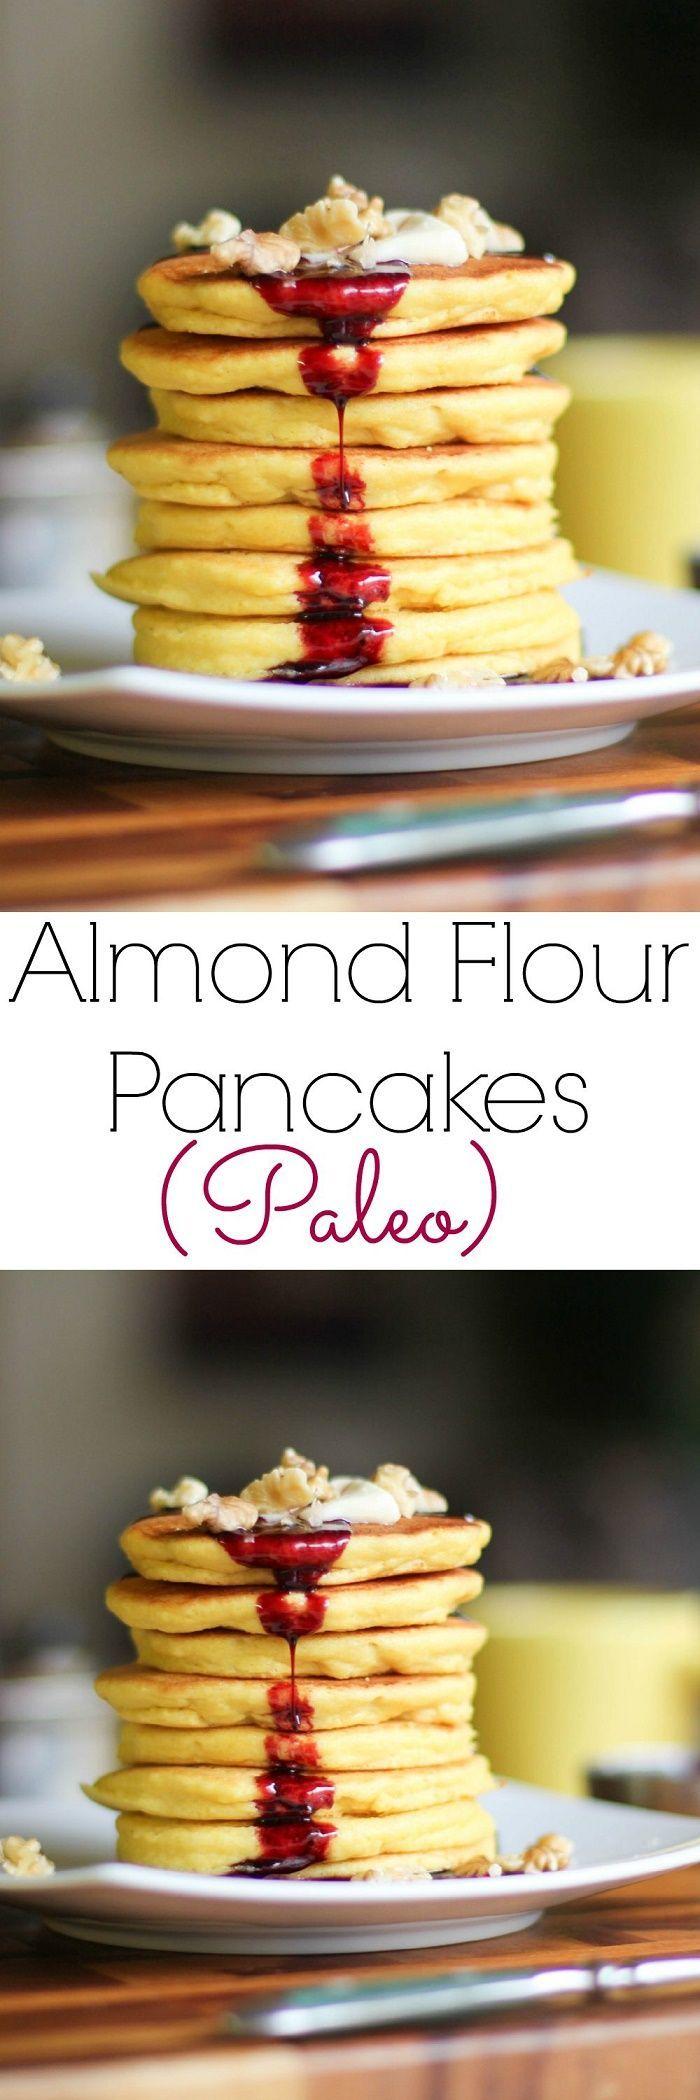 Almond Flour Pancakes | gluten-free, grain-free, and paleo! | http://TheRoastedRoot.net #healthy #breakfast #recipe